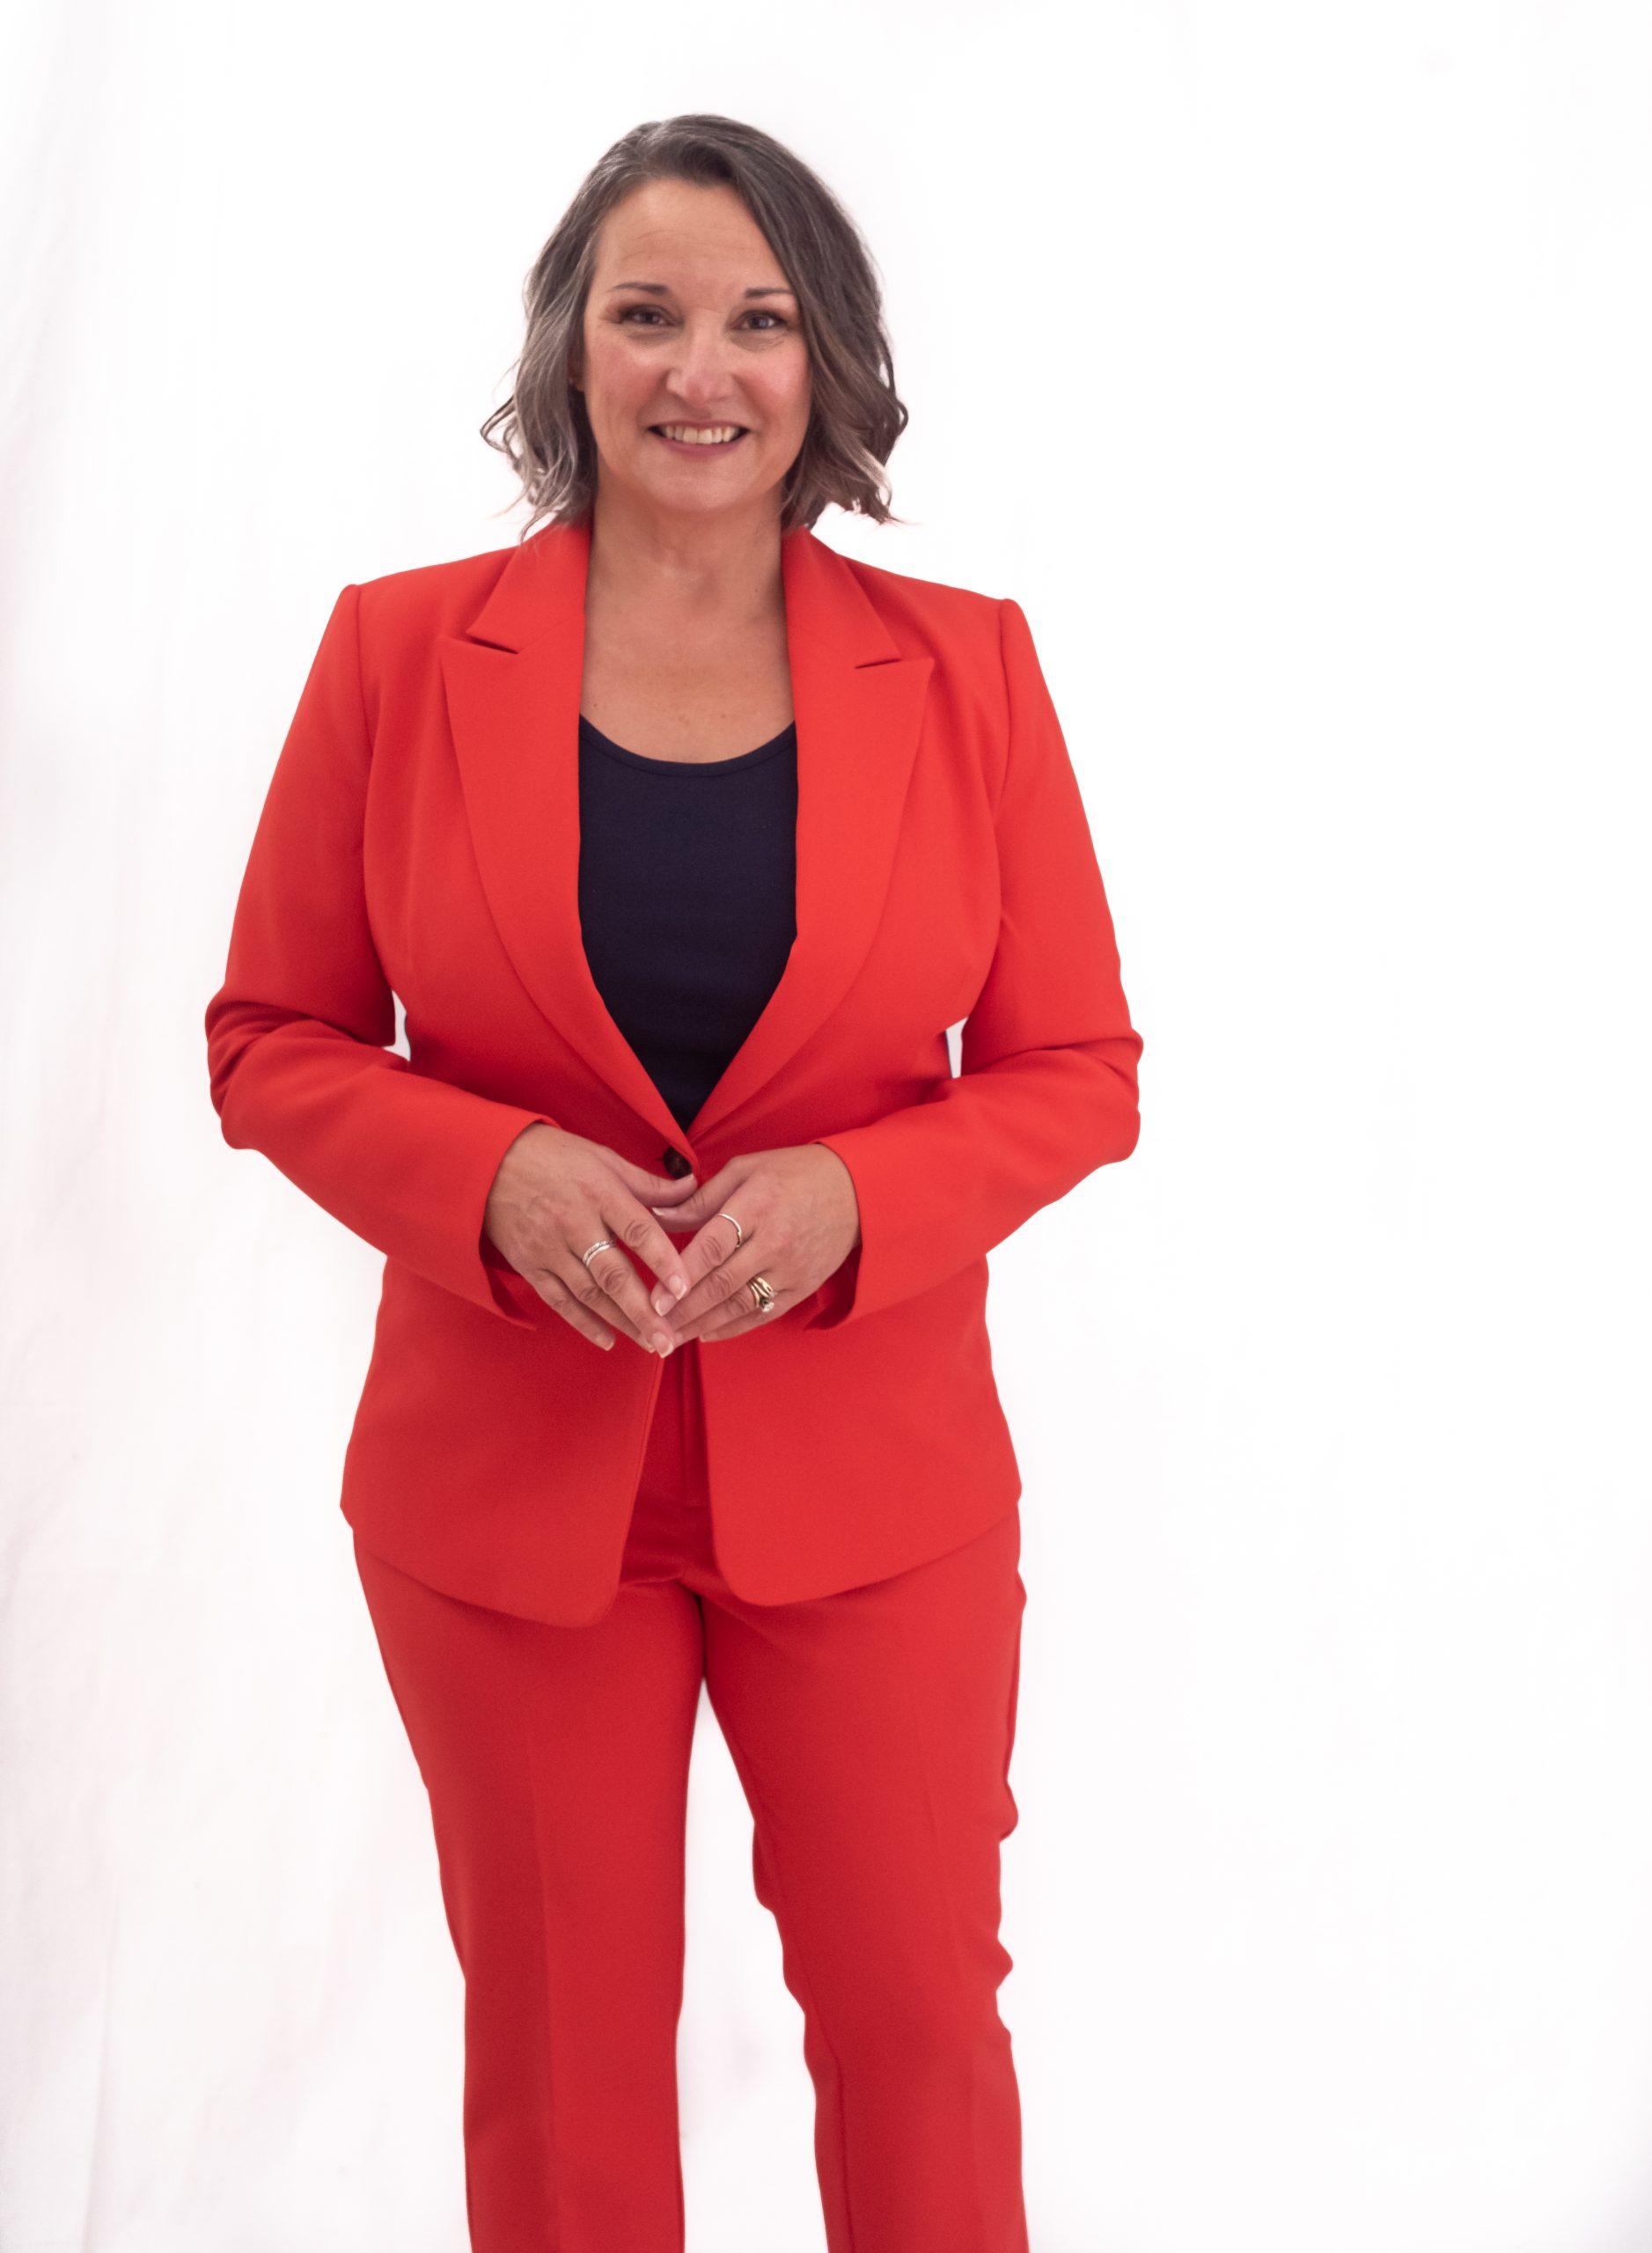 Professional image of Laura Templeton